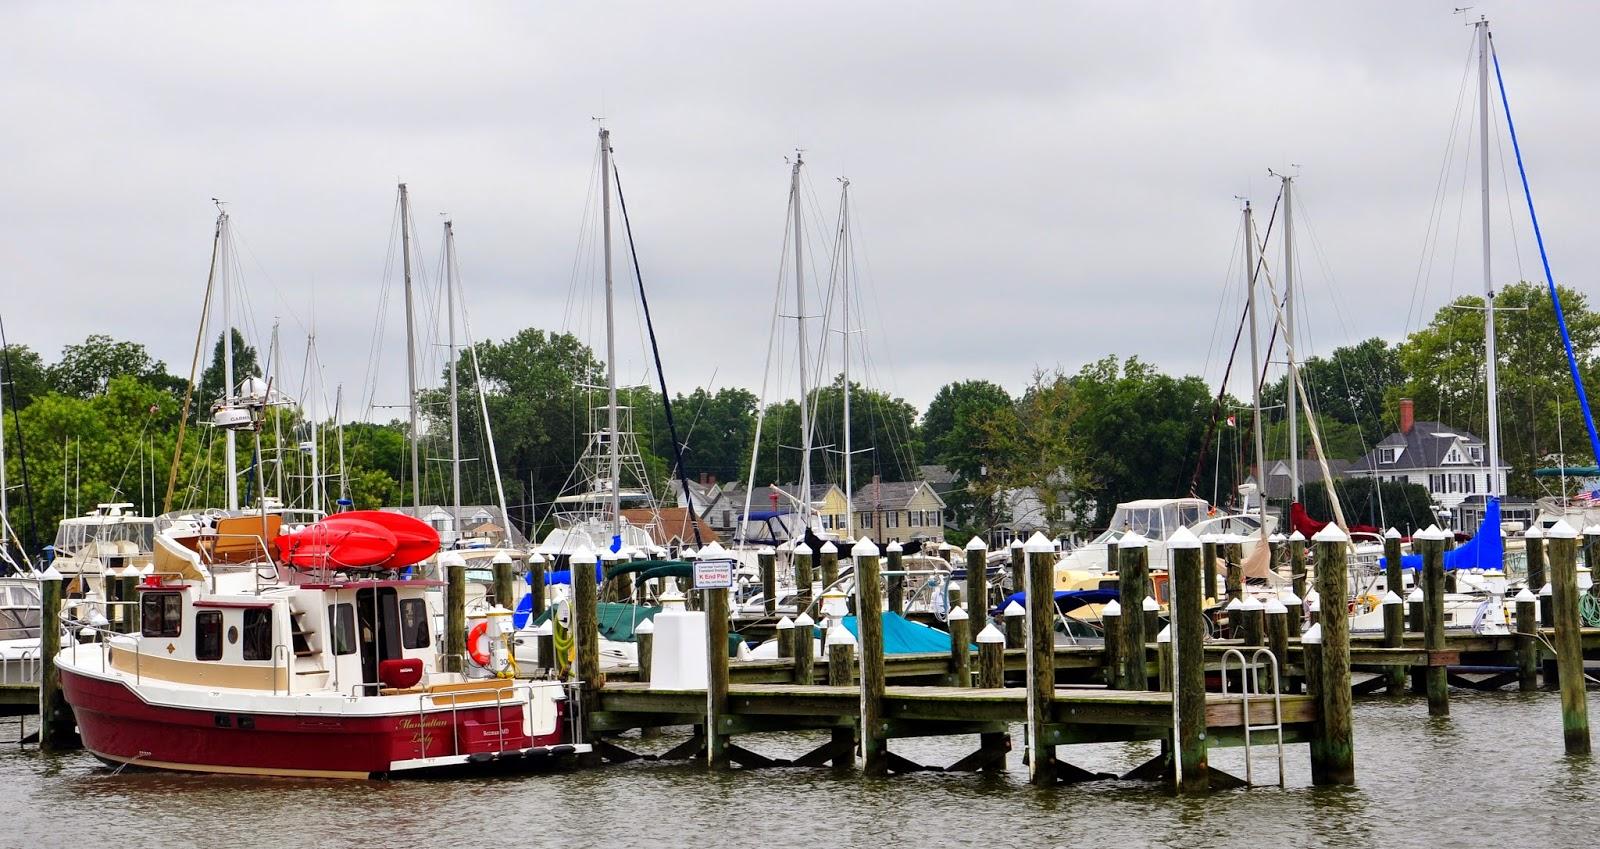 Baltimore Fishbowl | Cambridge, Maryland: A Hidden Gem